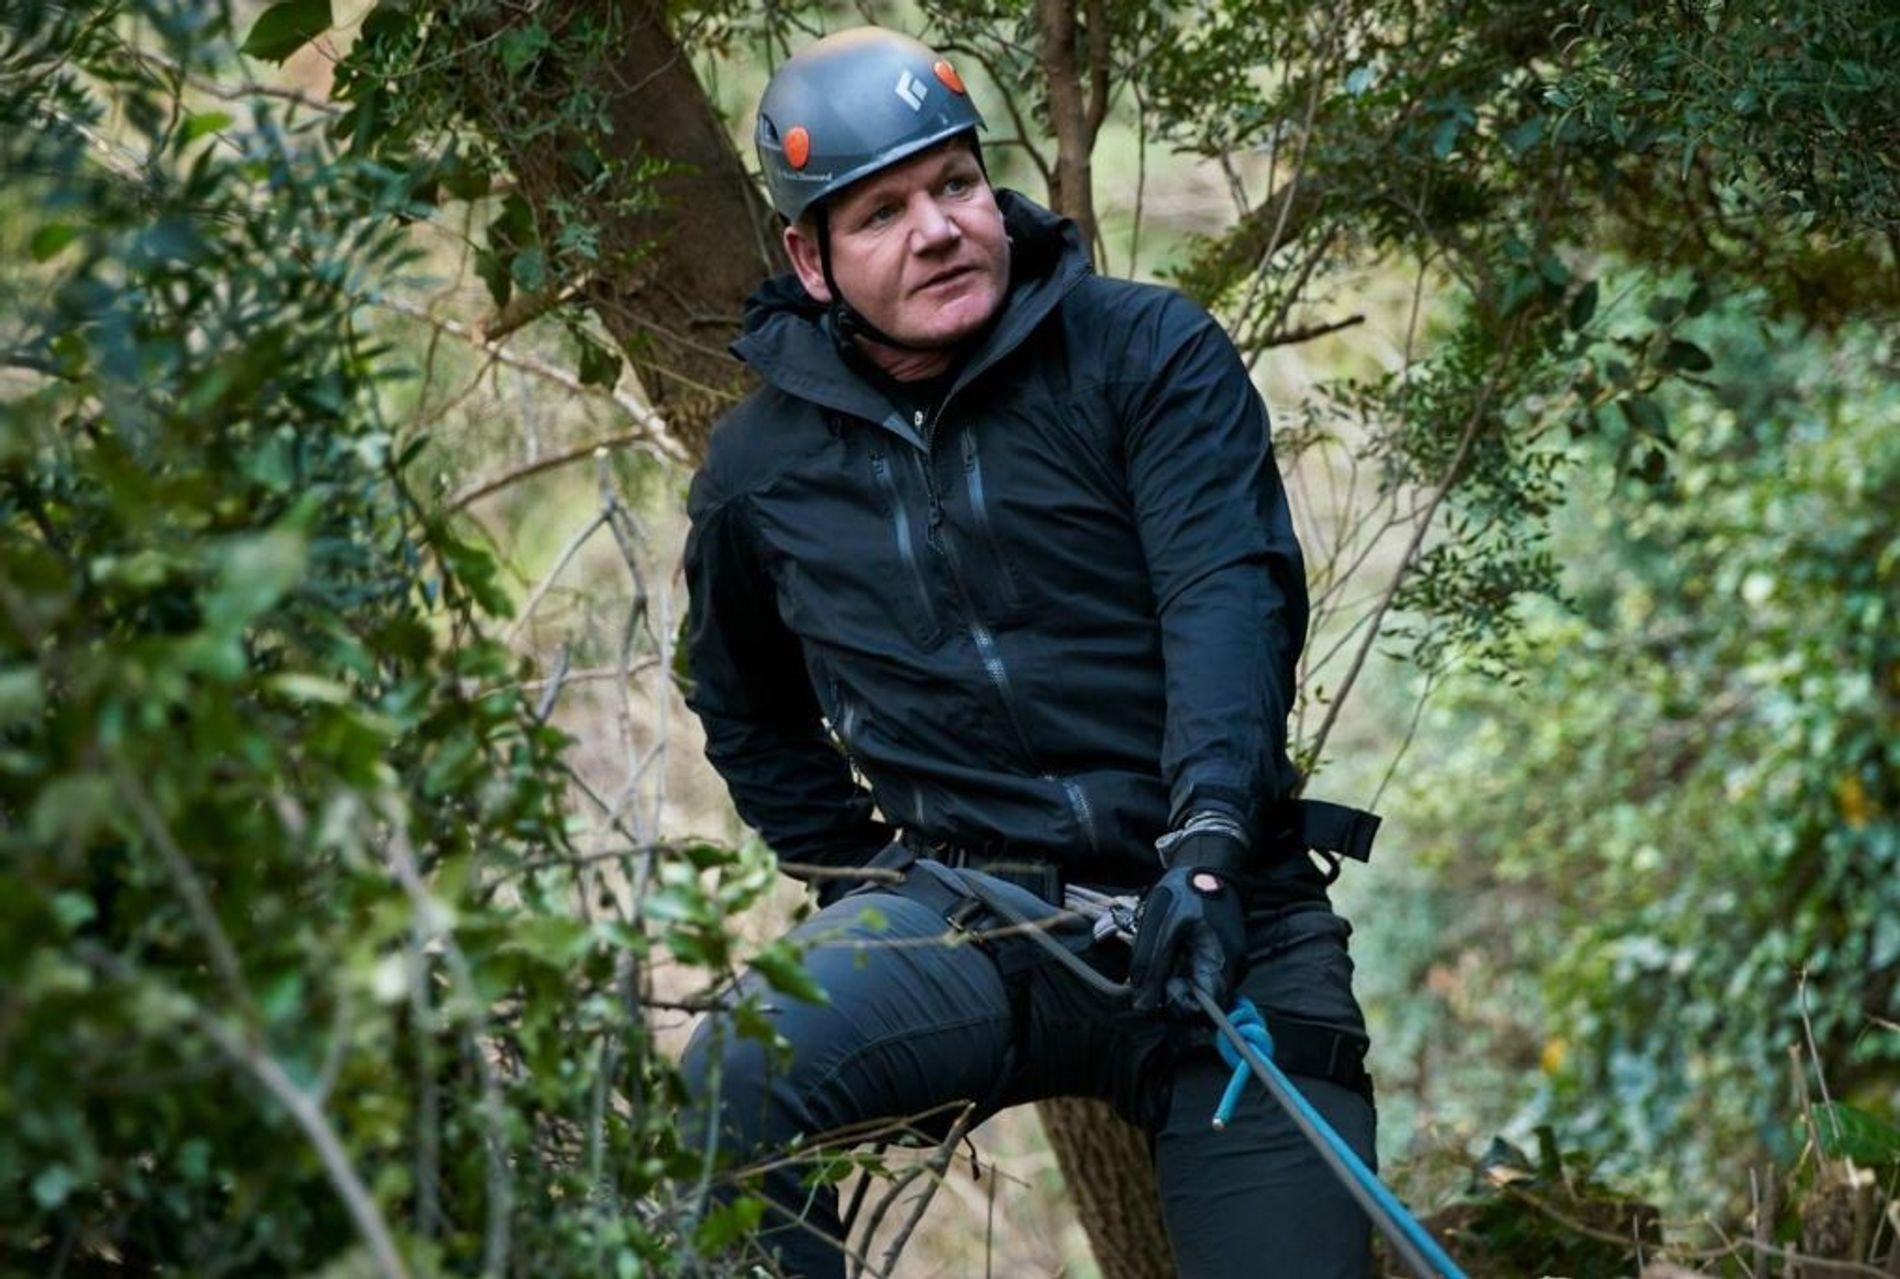 Gordon Ramsay percorre trilhas nas montanhas do Marrocos